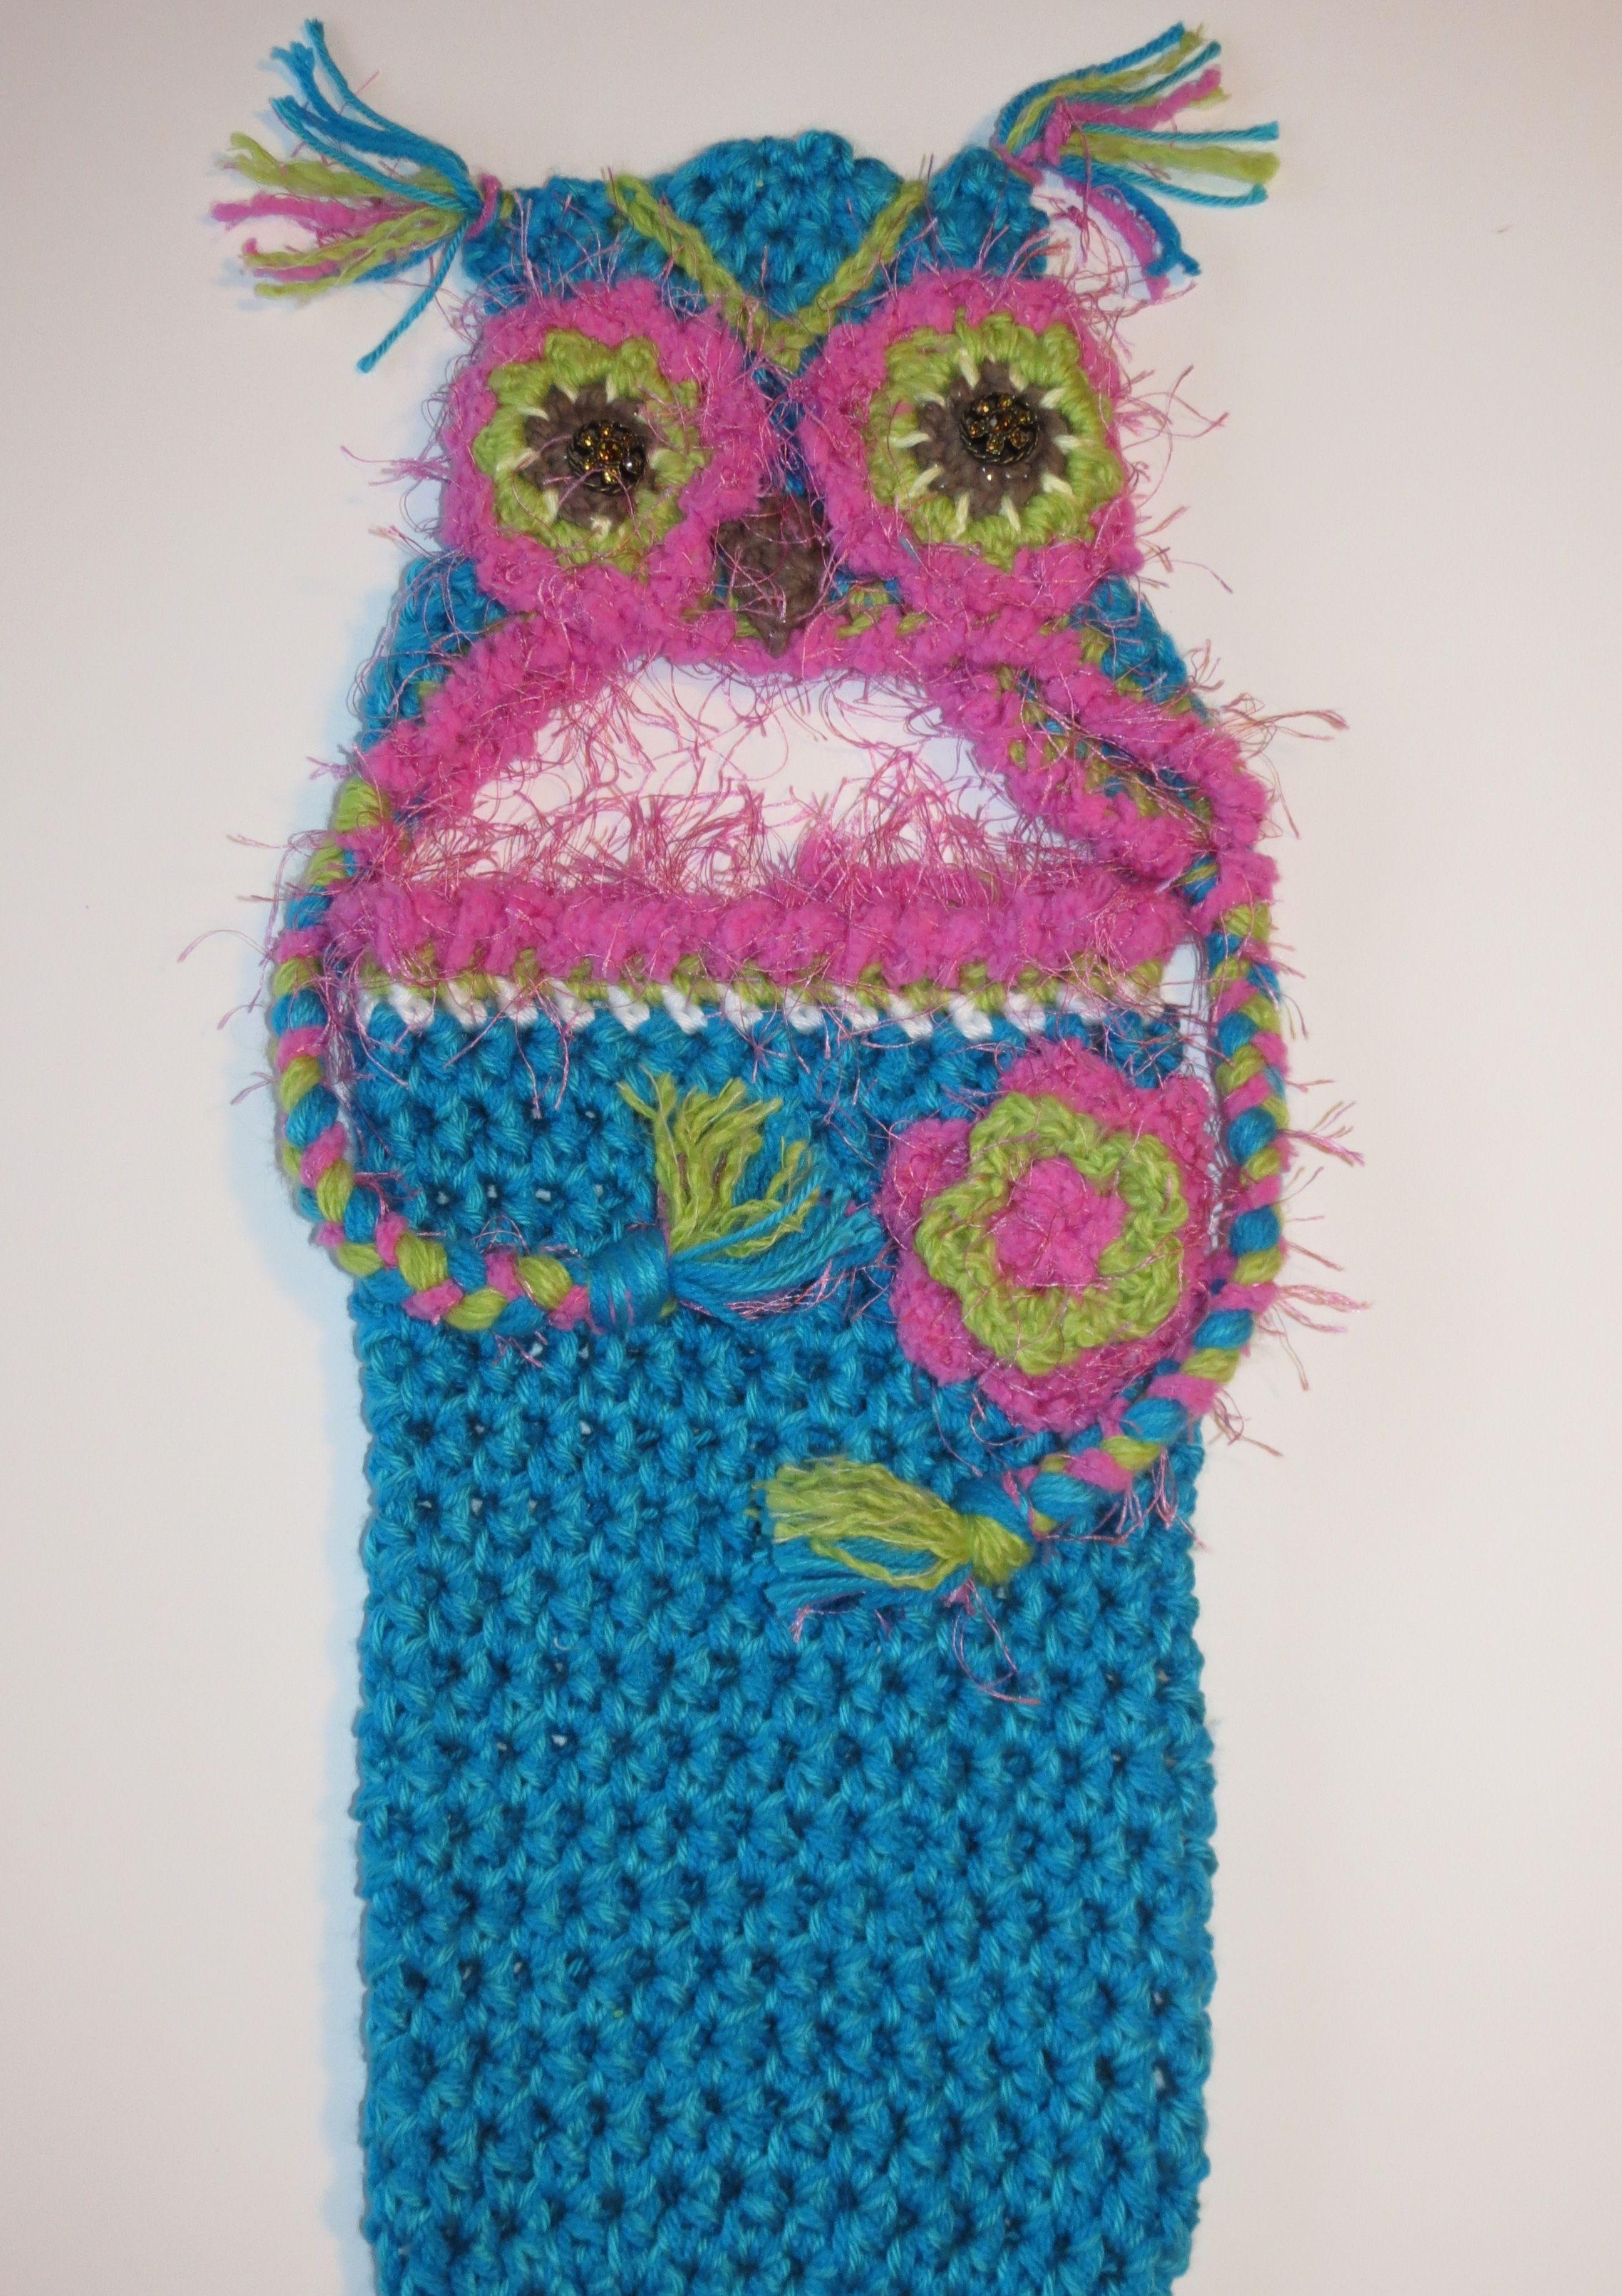 Crochet Owl Cocoon : Crochet Girl Owl Hat & Cocoon Crochet Pinterest